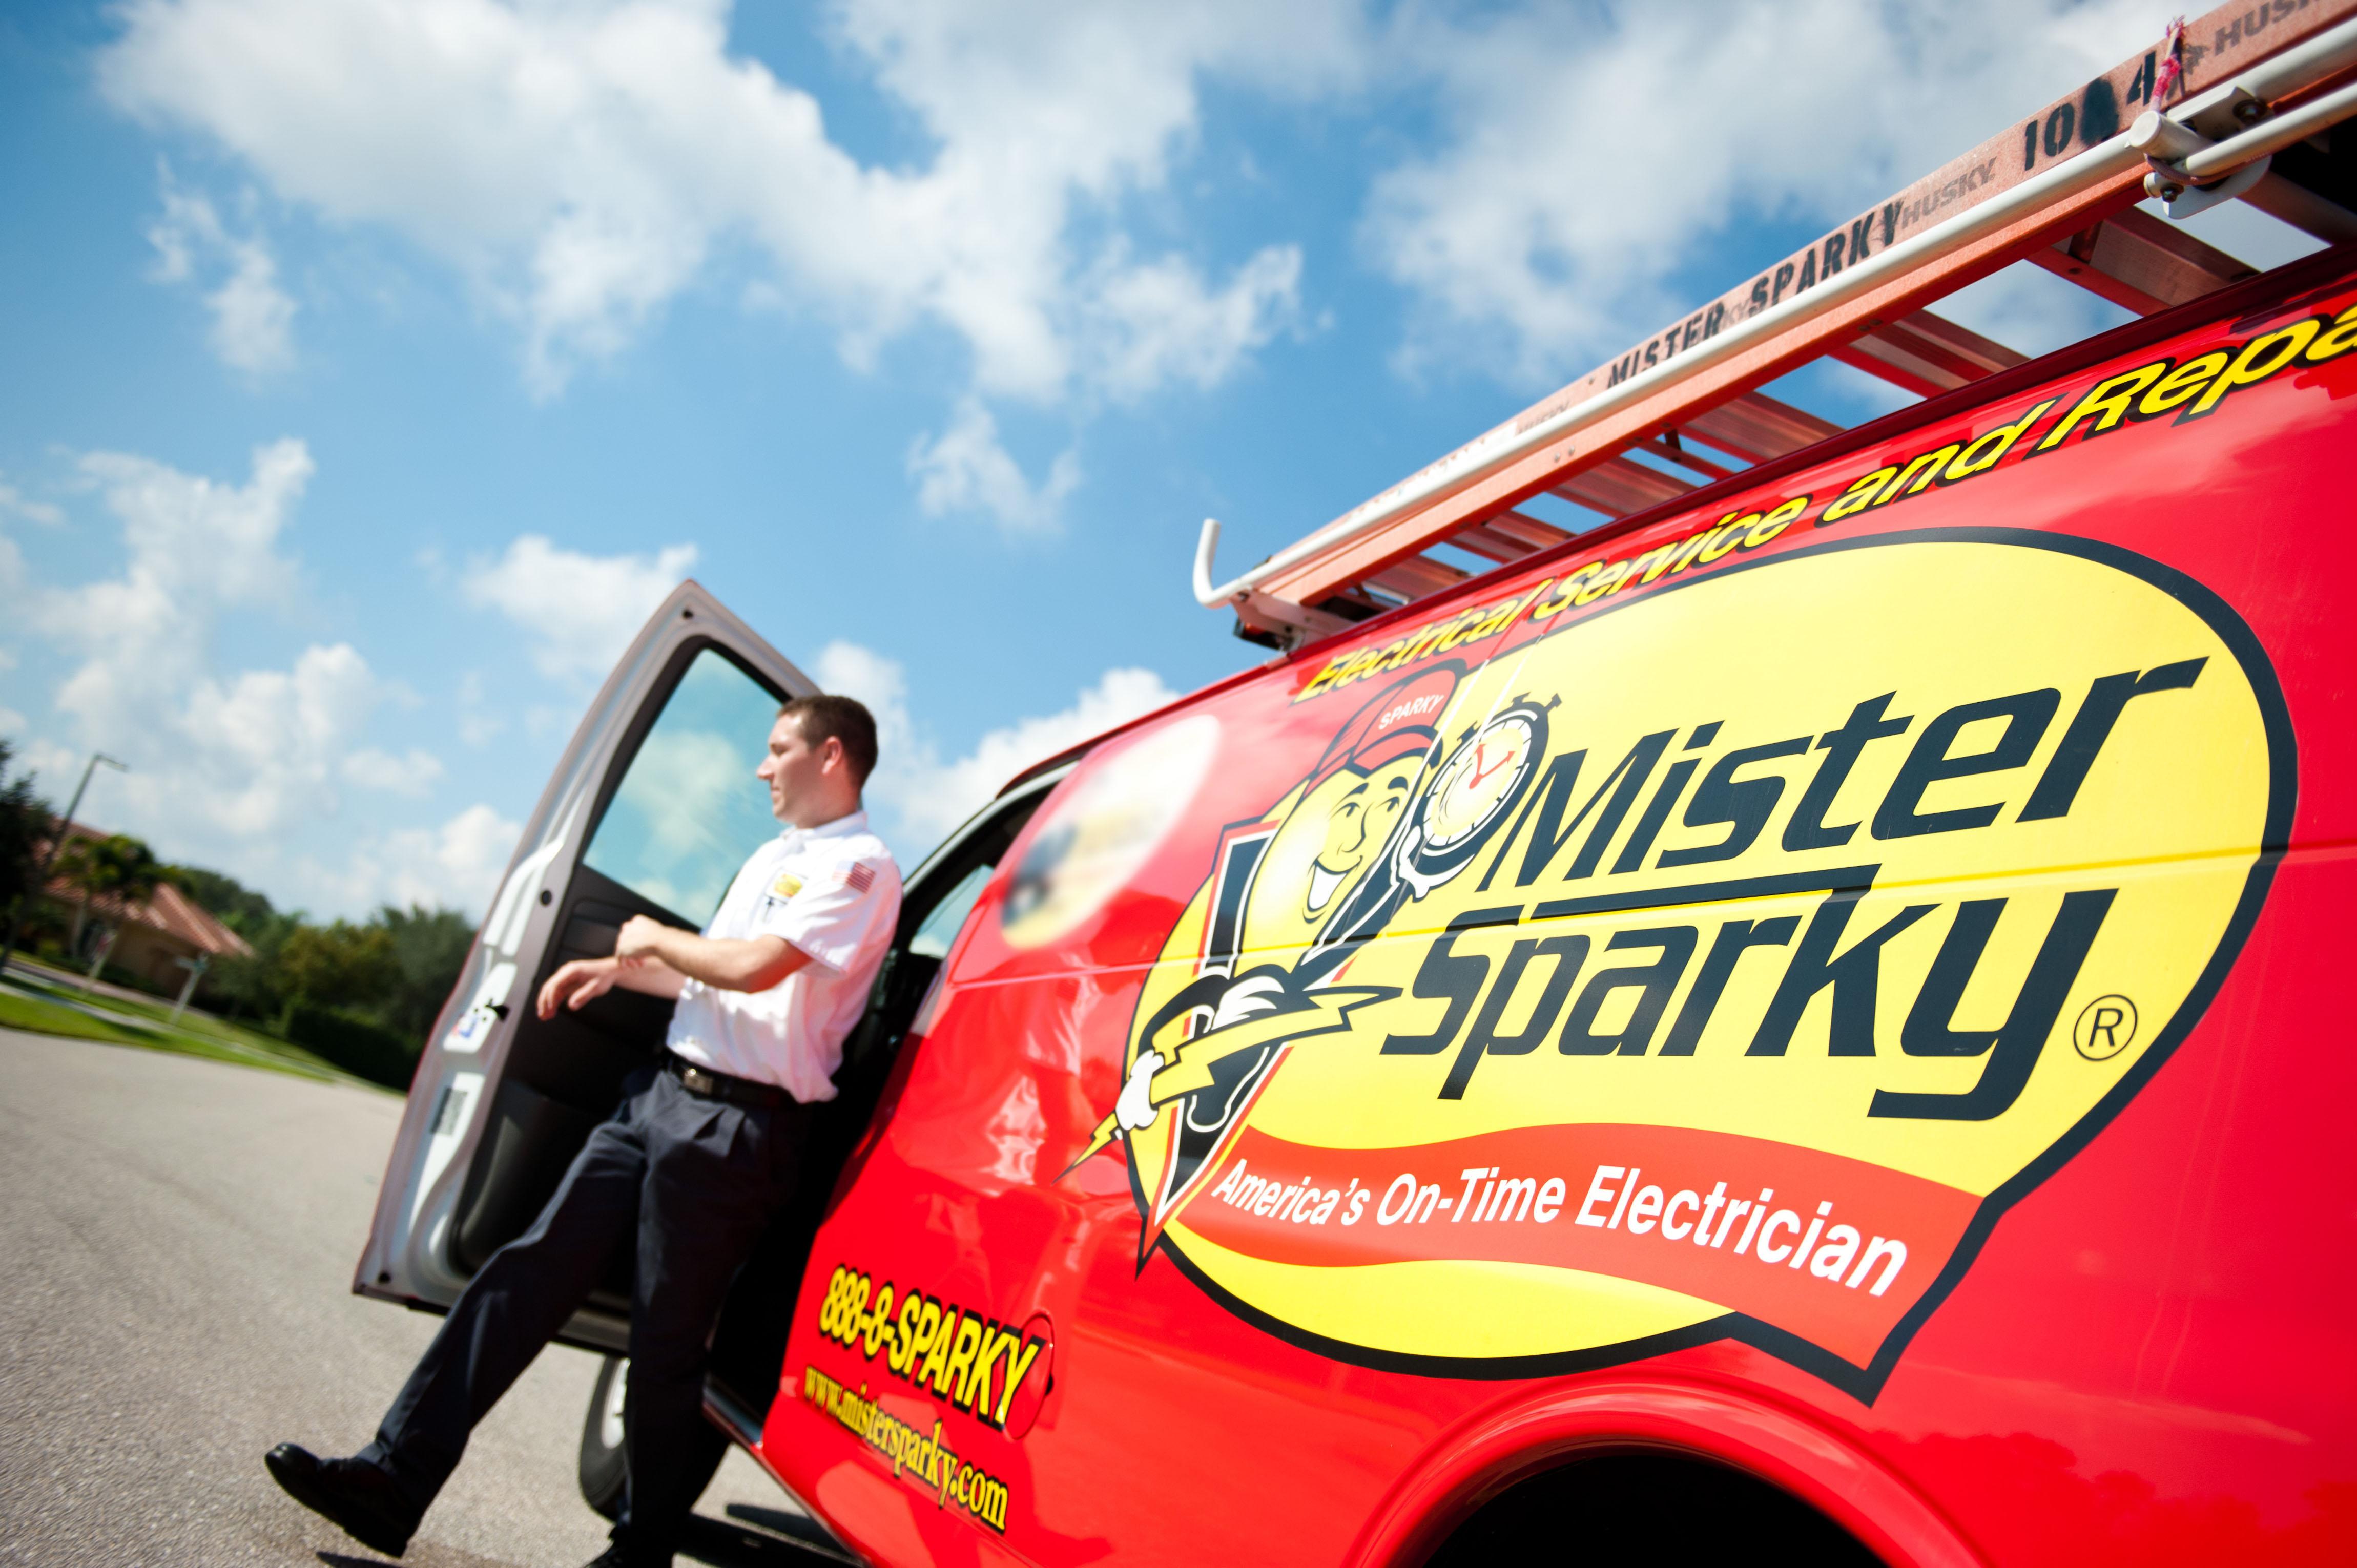 Mister Sparky Electrician Katy Coupons Katy Tx Near Me